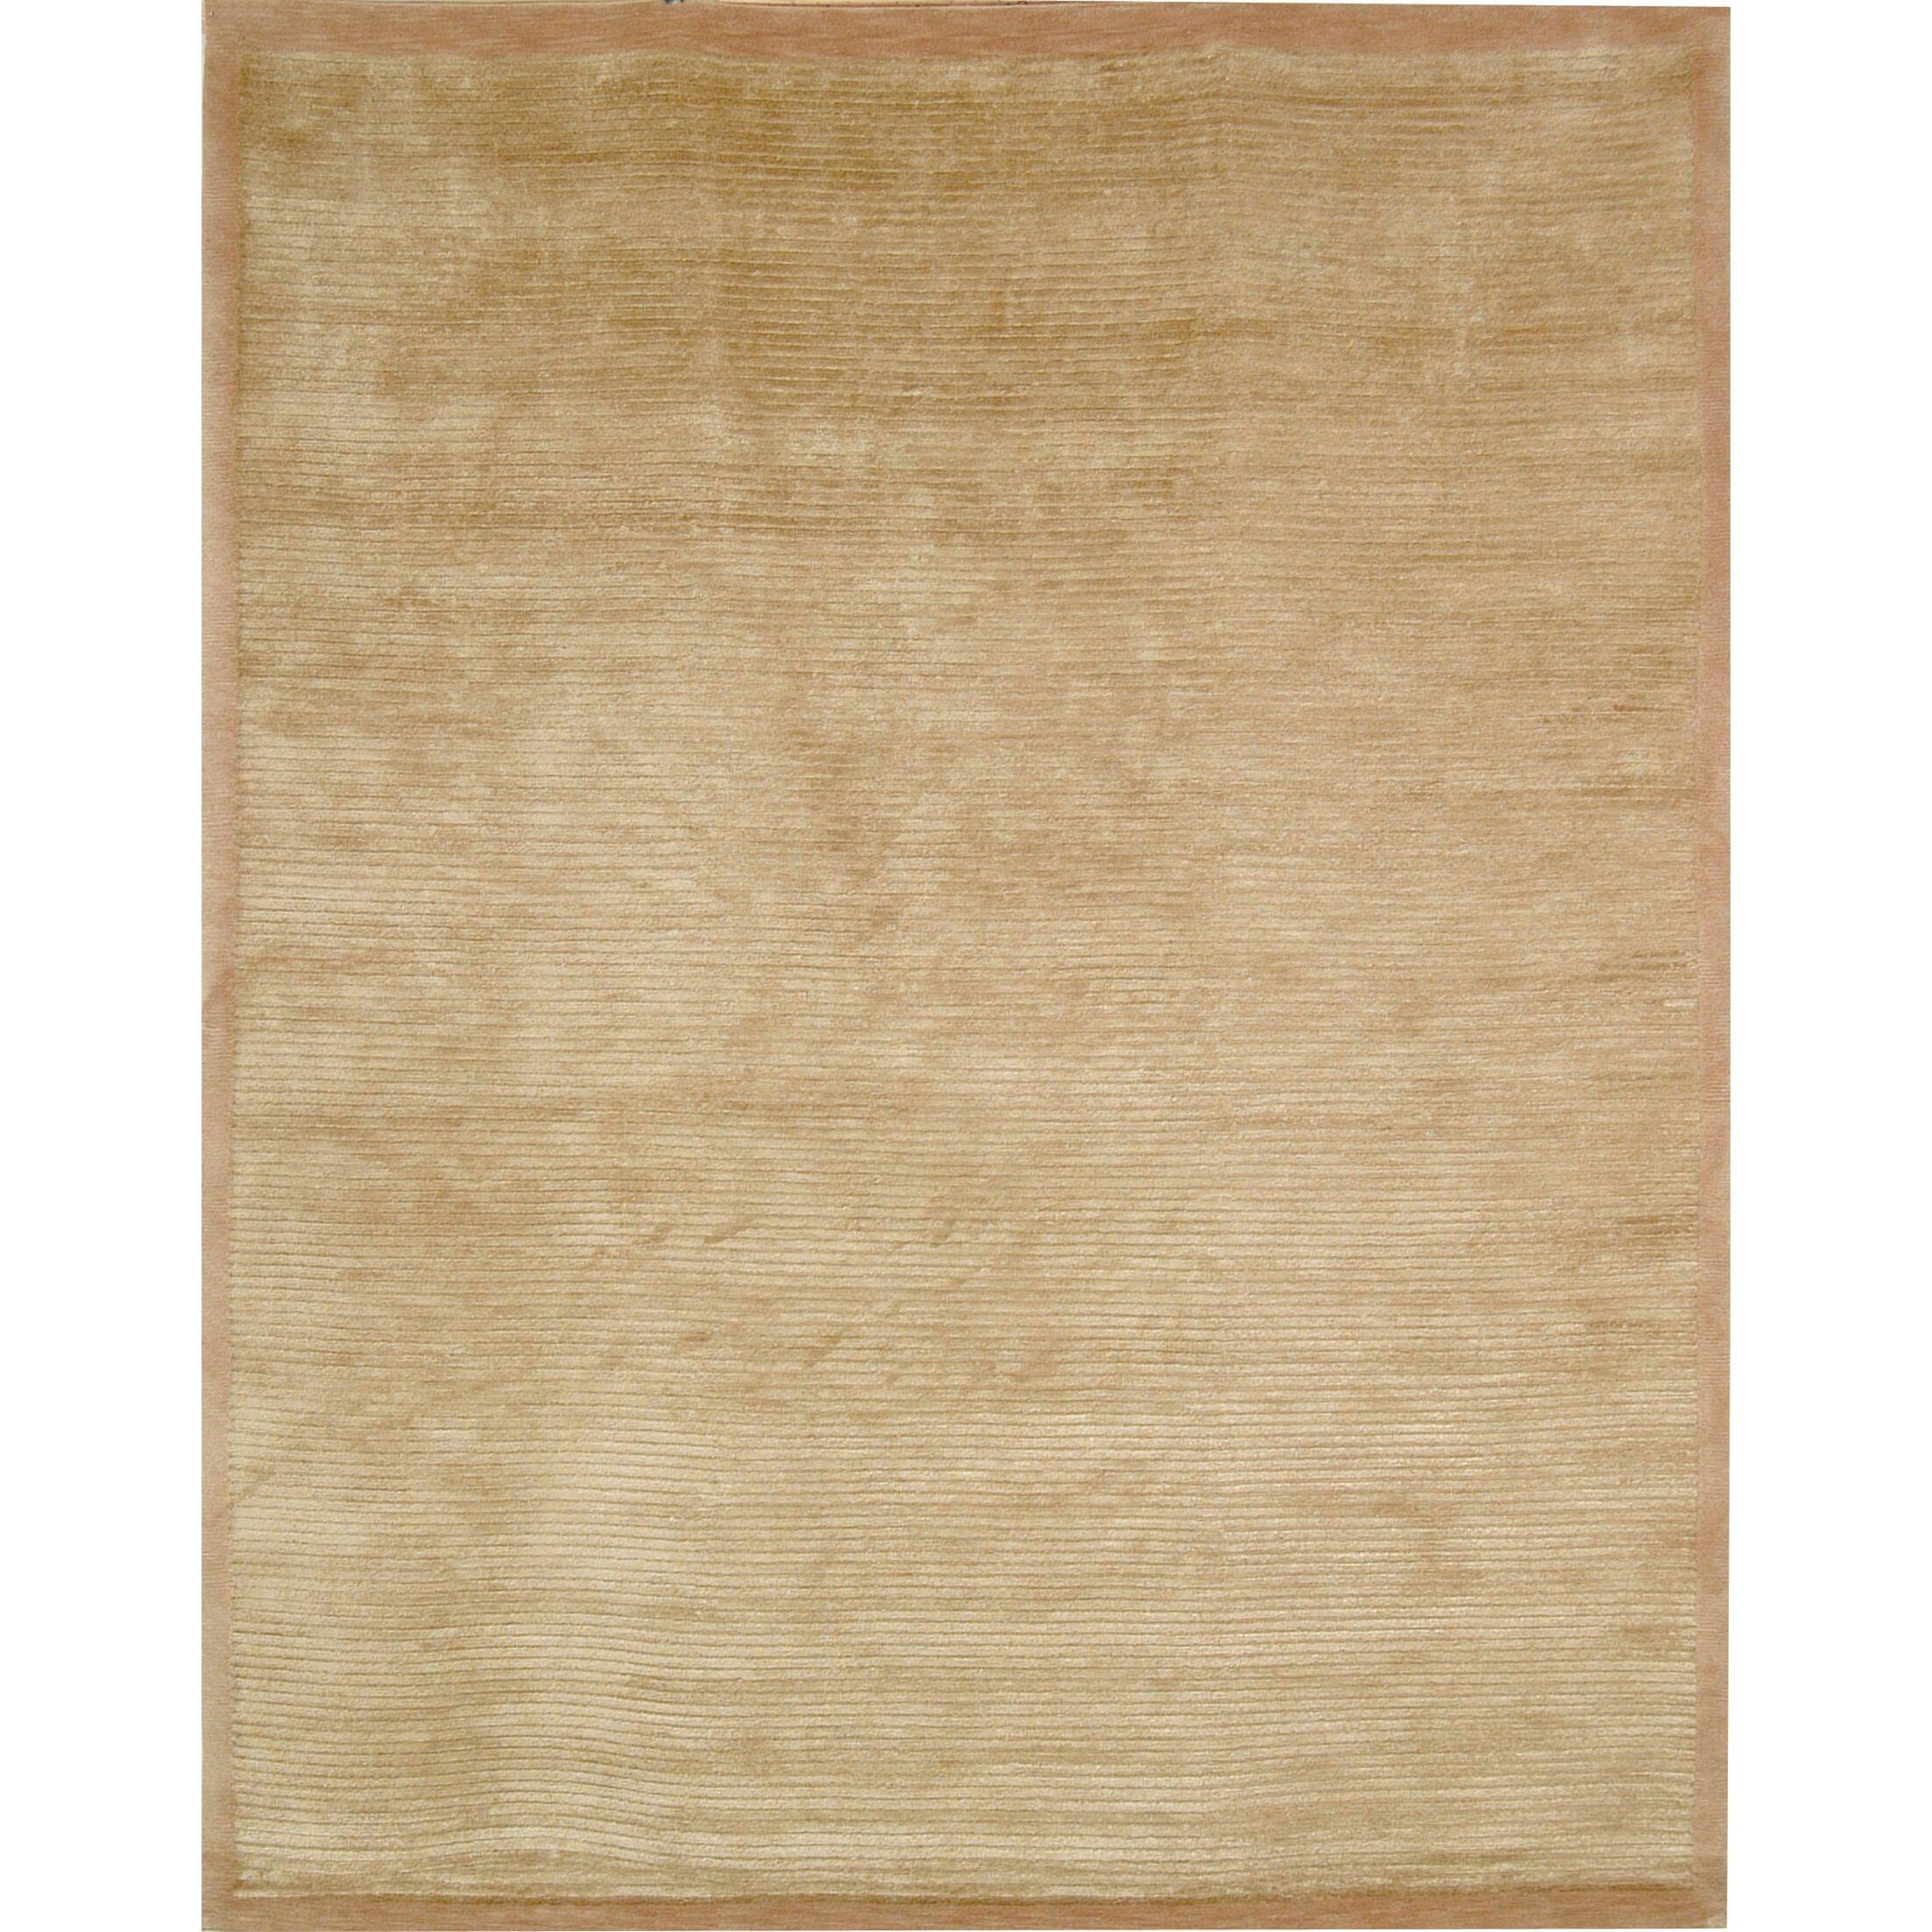 Velvet Wool Straw Tan Area Rug Rug Size: Rectangle 8' x 10'